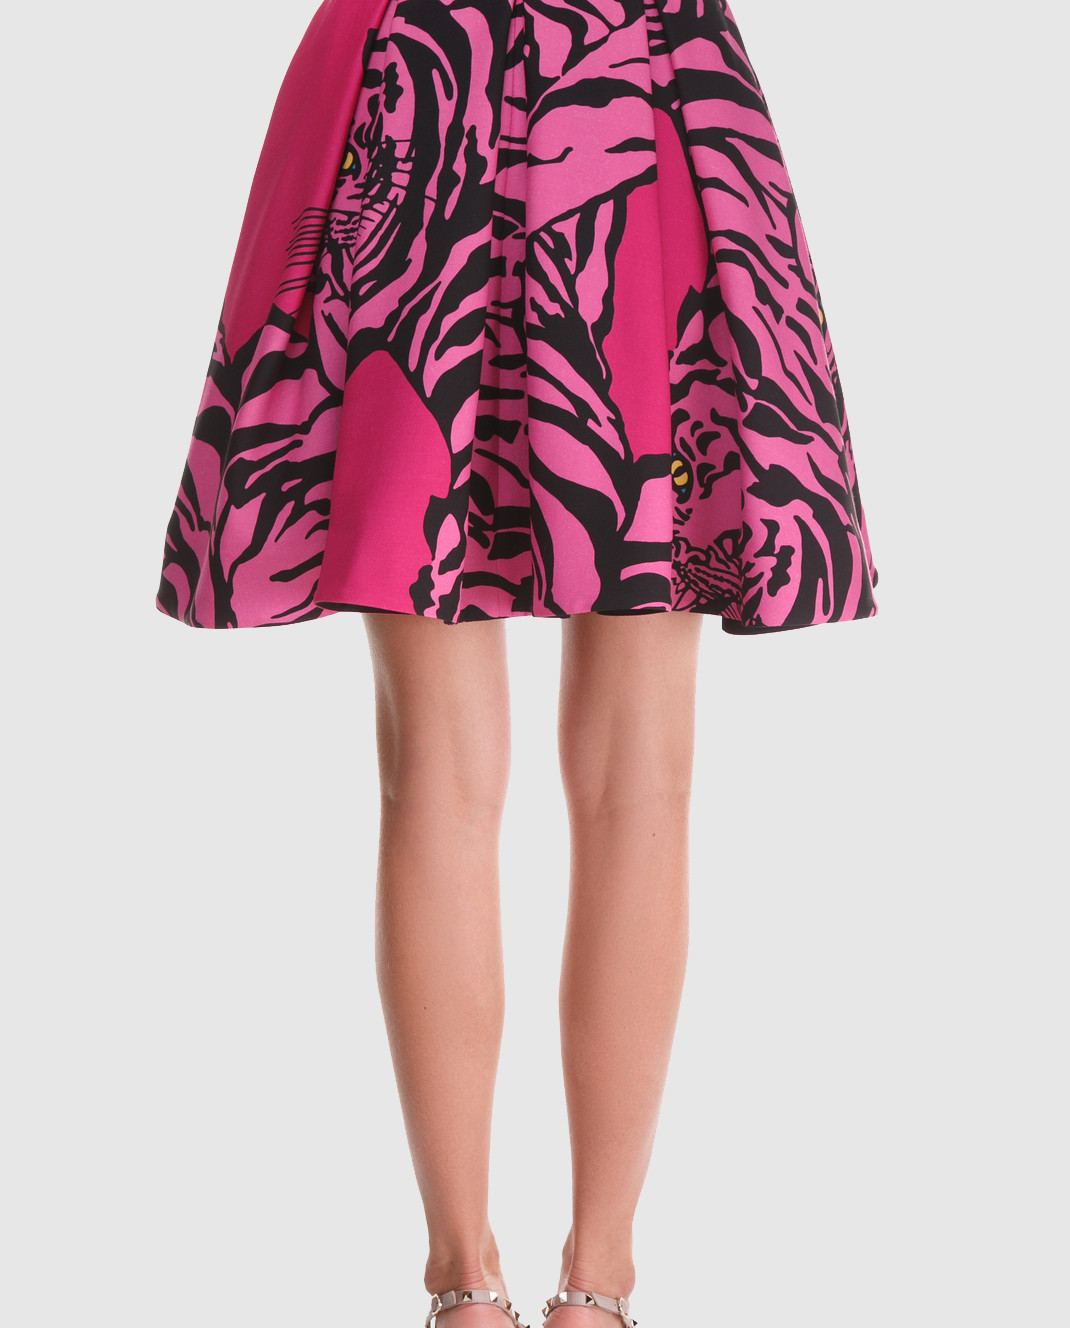 Valentino Розовая юбка из шерсти и шелка QB3RA3W546B изображение 4